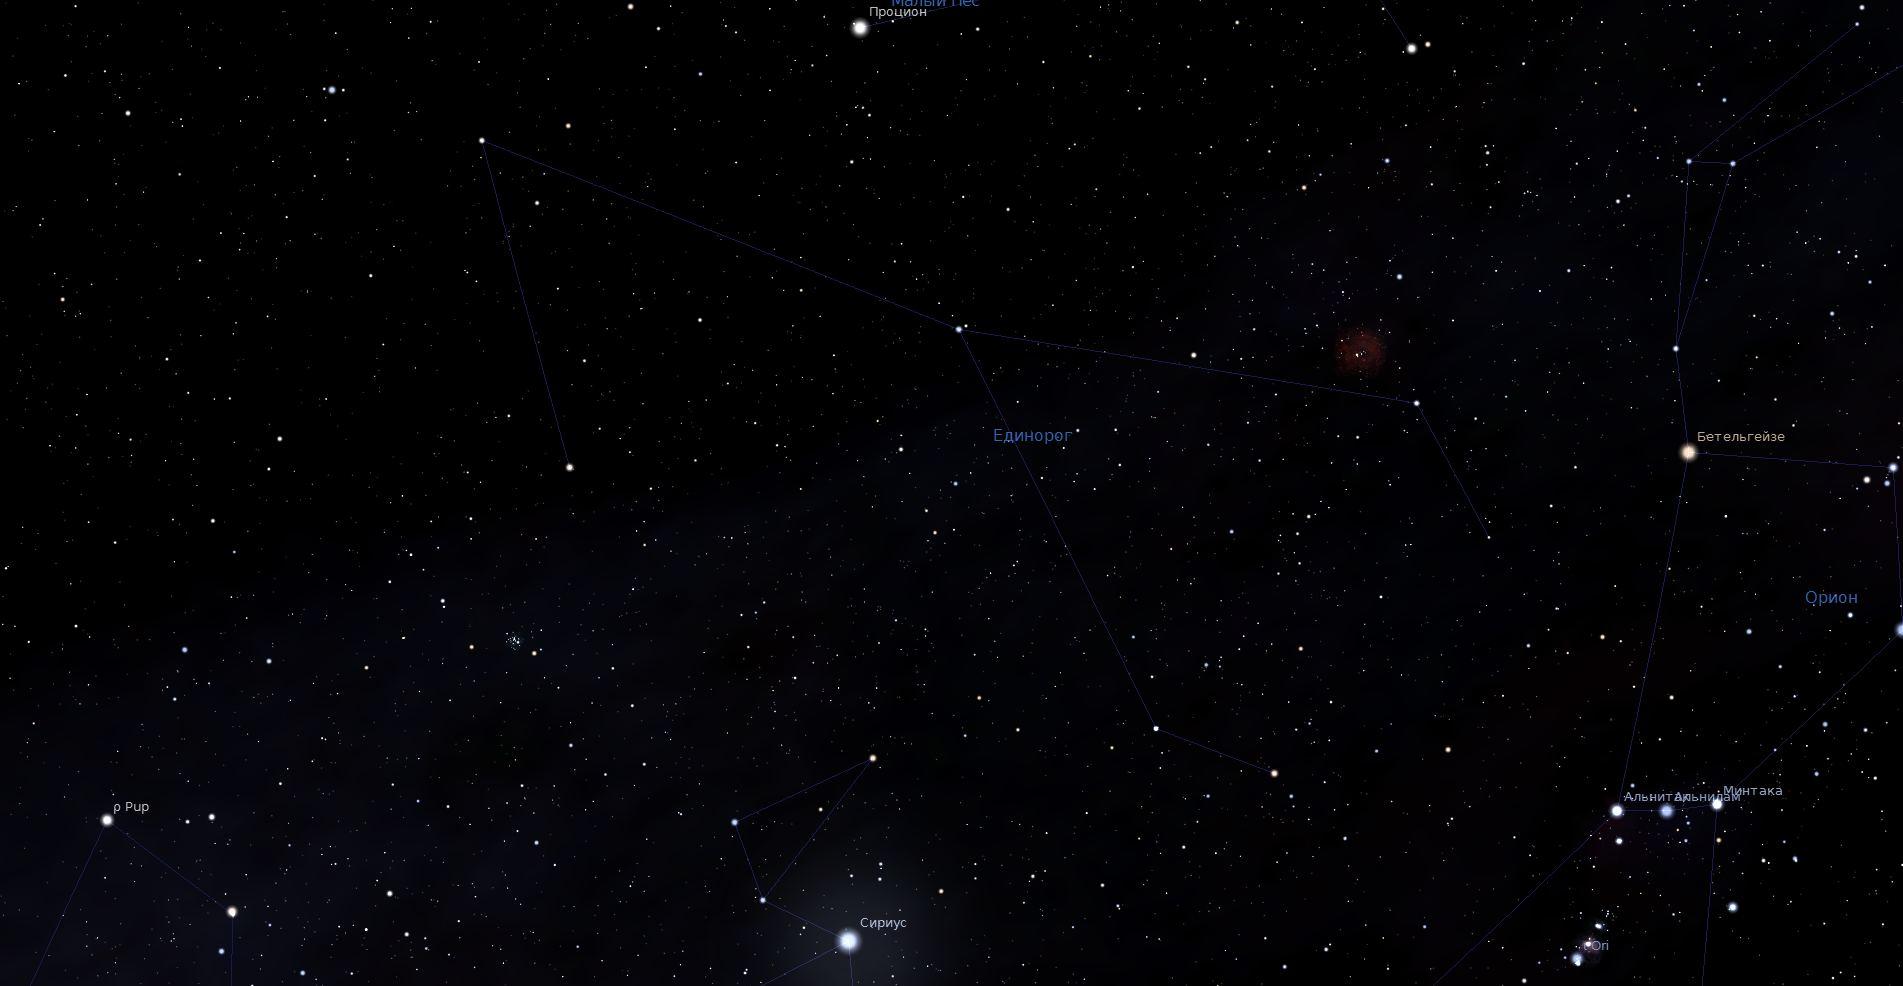 Созвездие Единорог, вид в программу планетарий